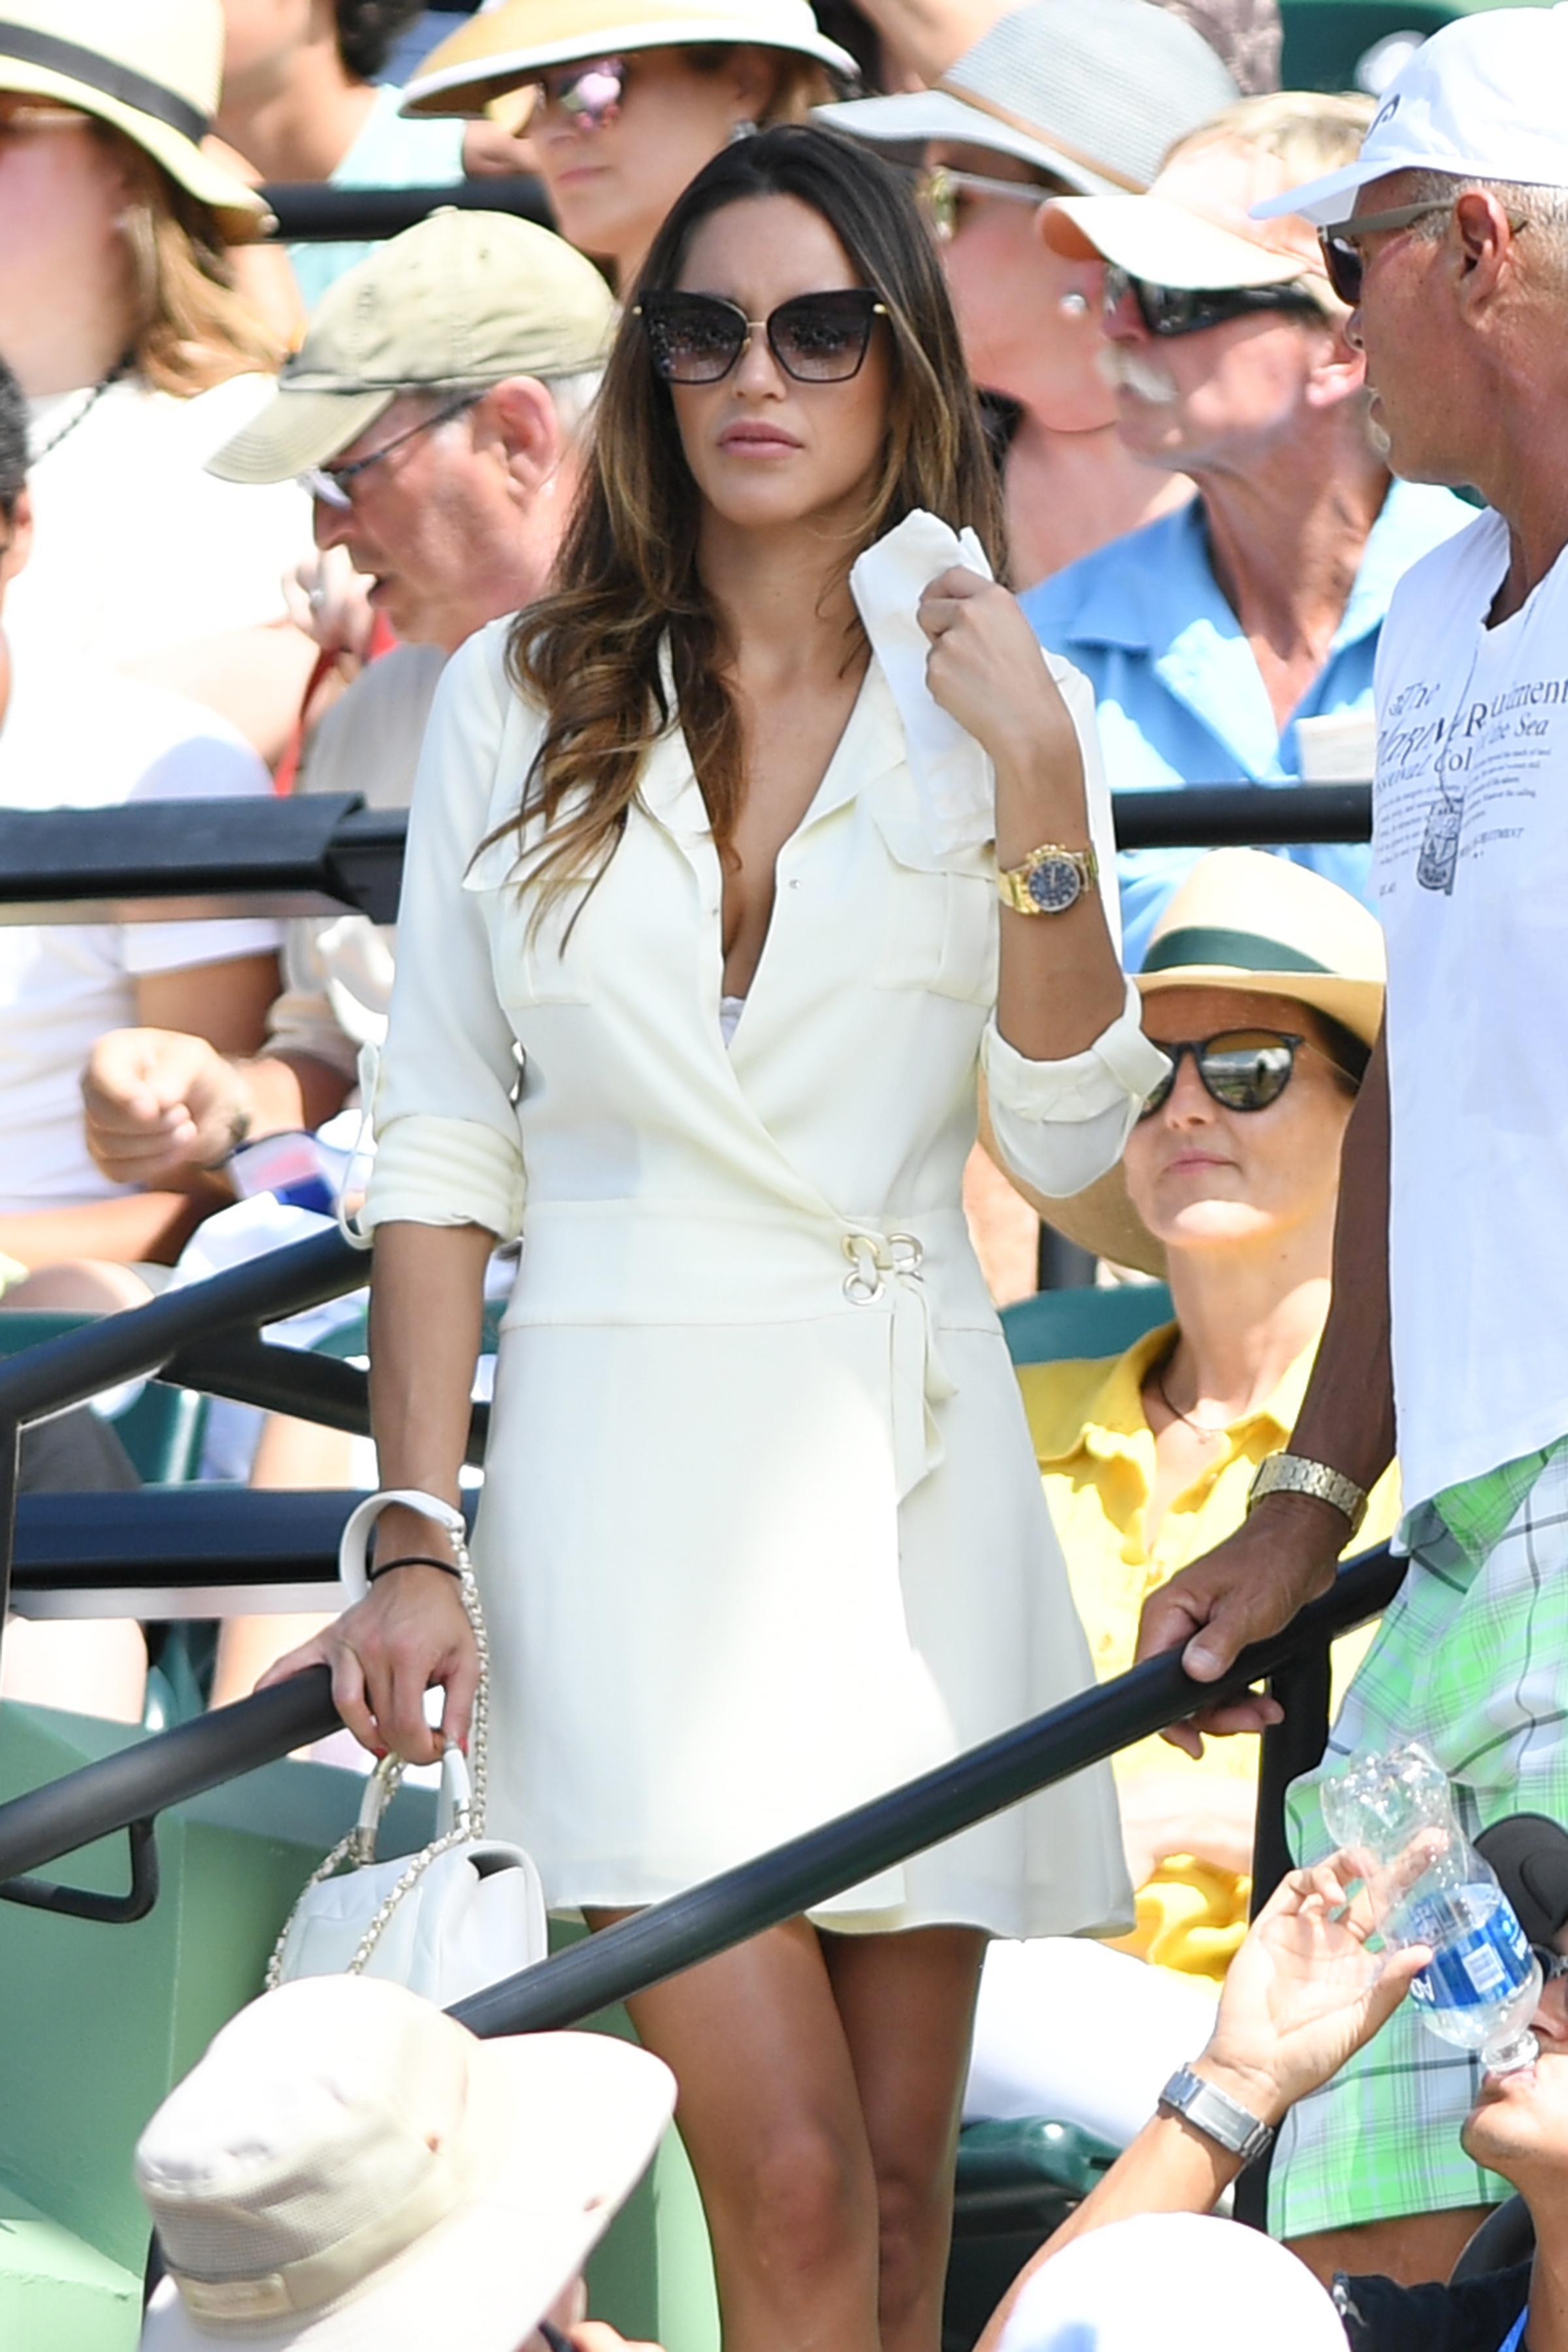 Julia Rohden dazzled at the 2017 Wimbledon championships